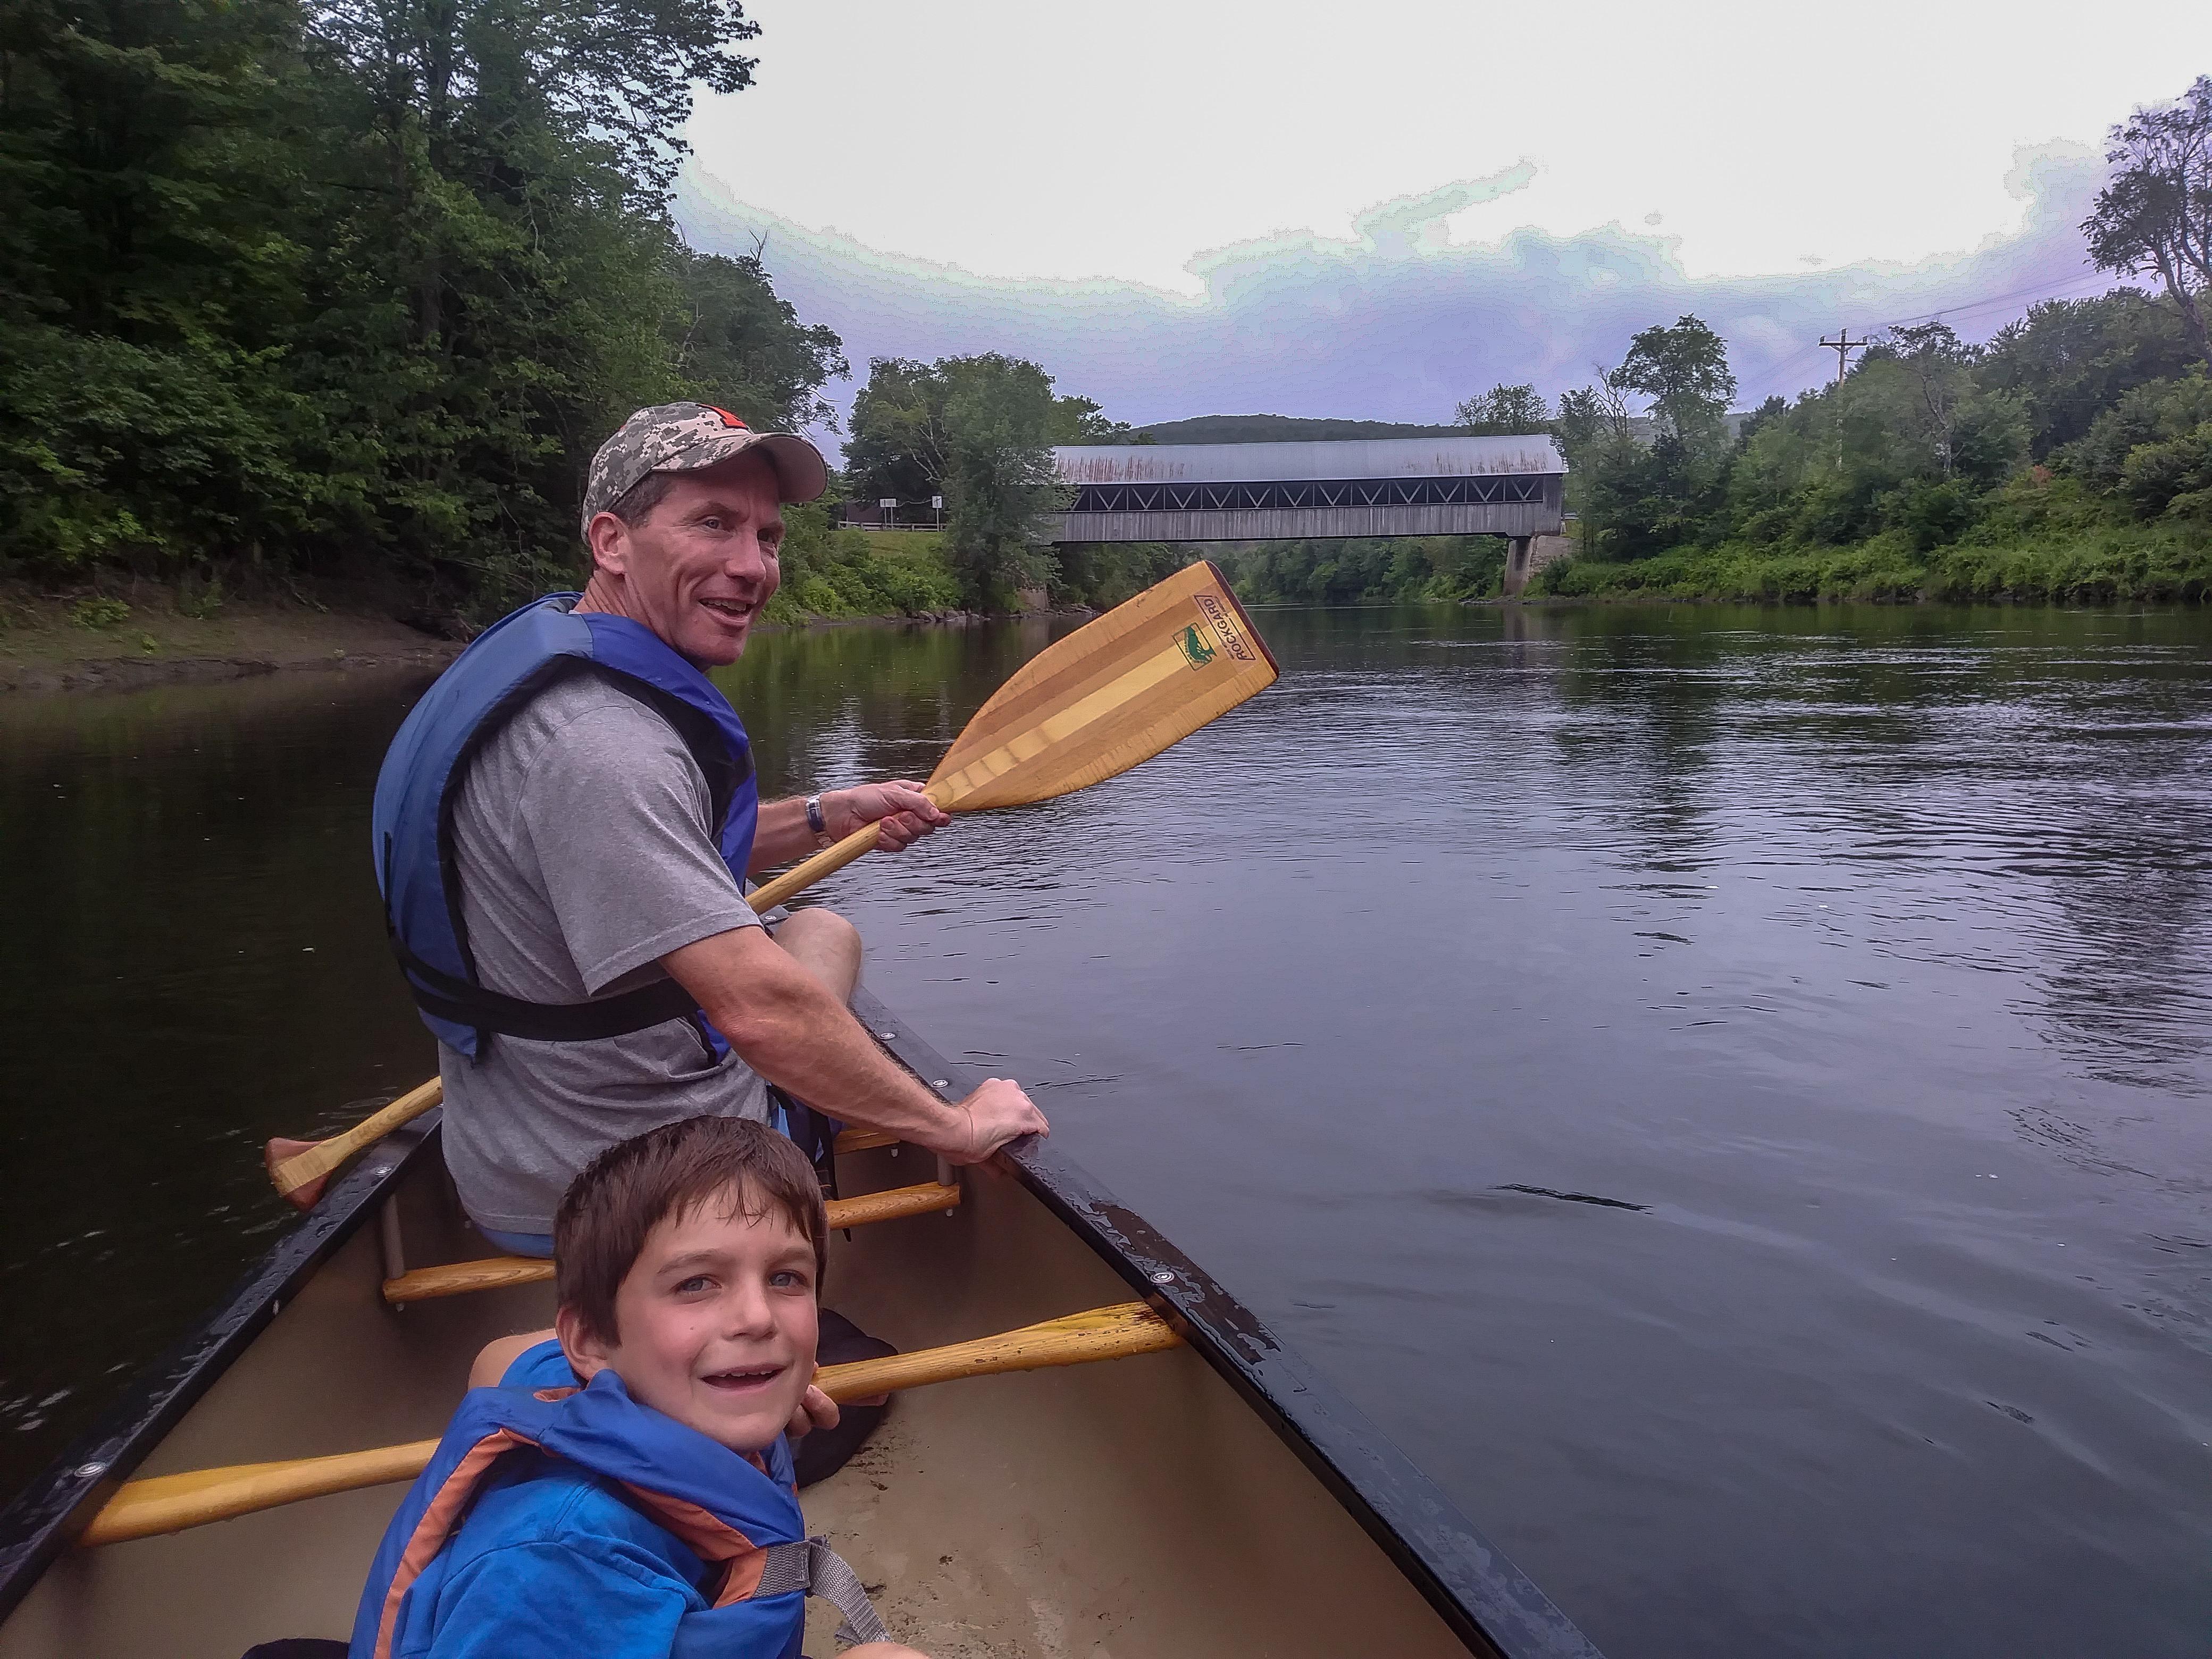 Clyde River Canoe Adventure